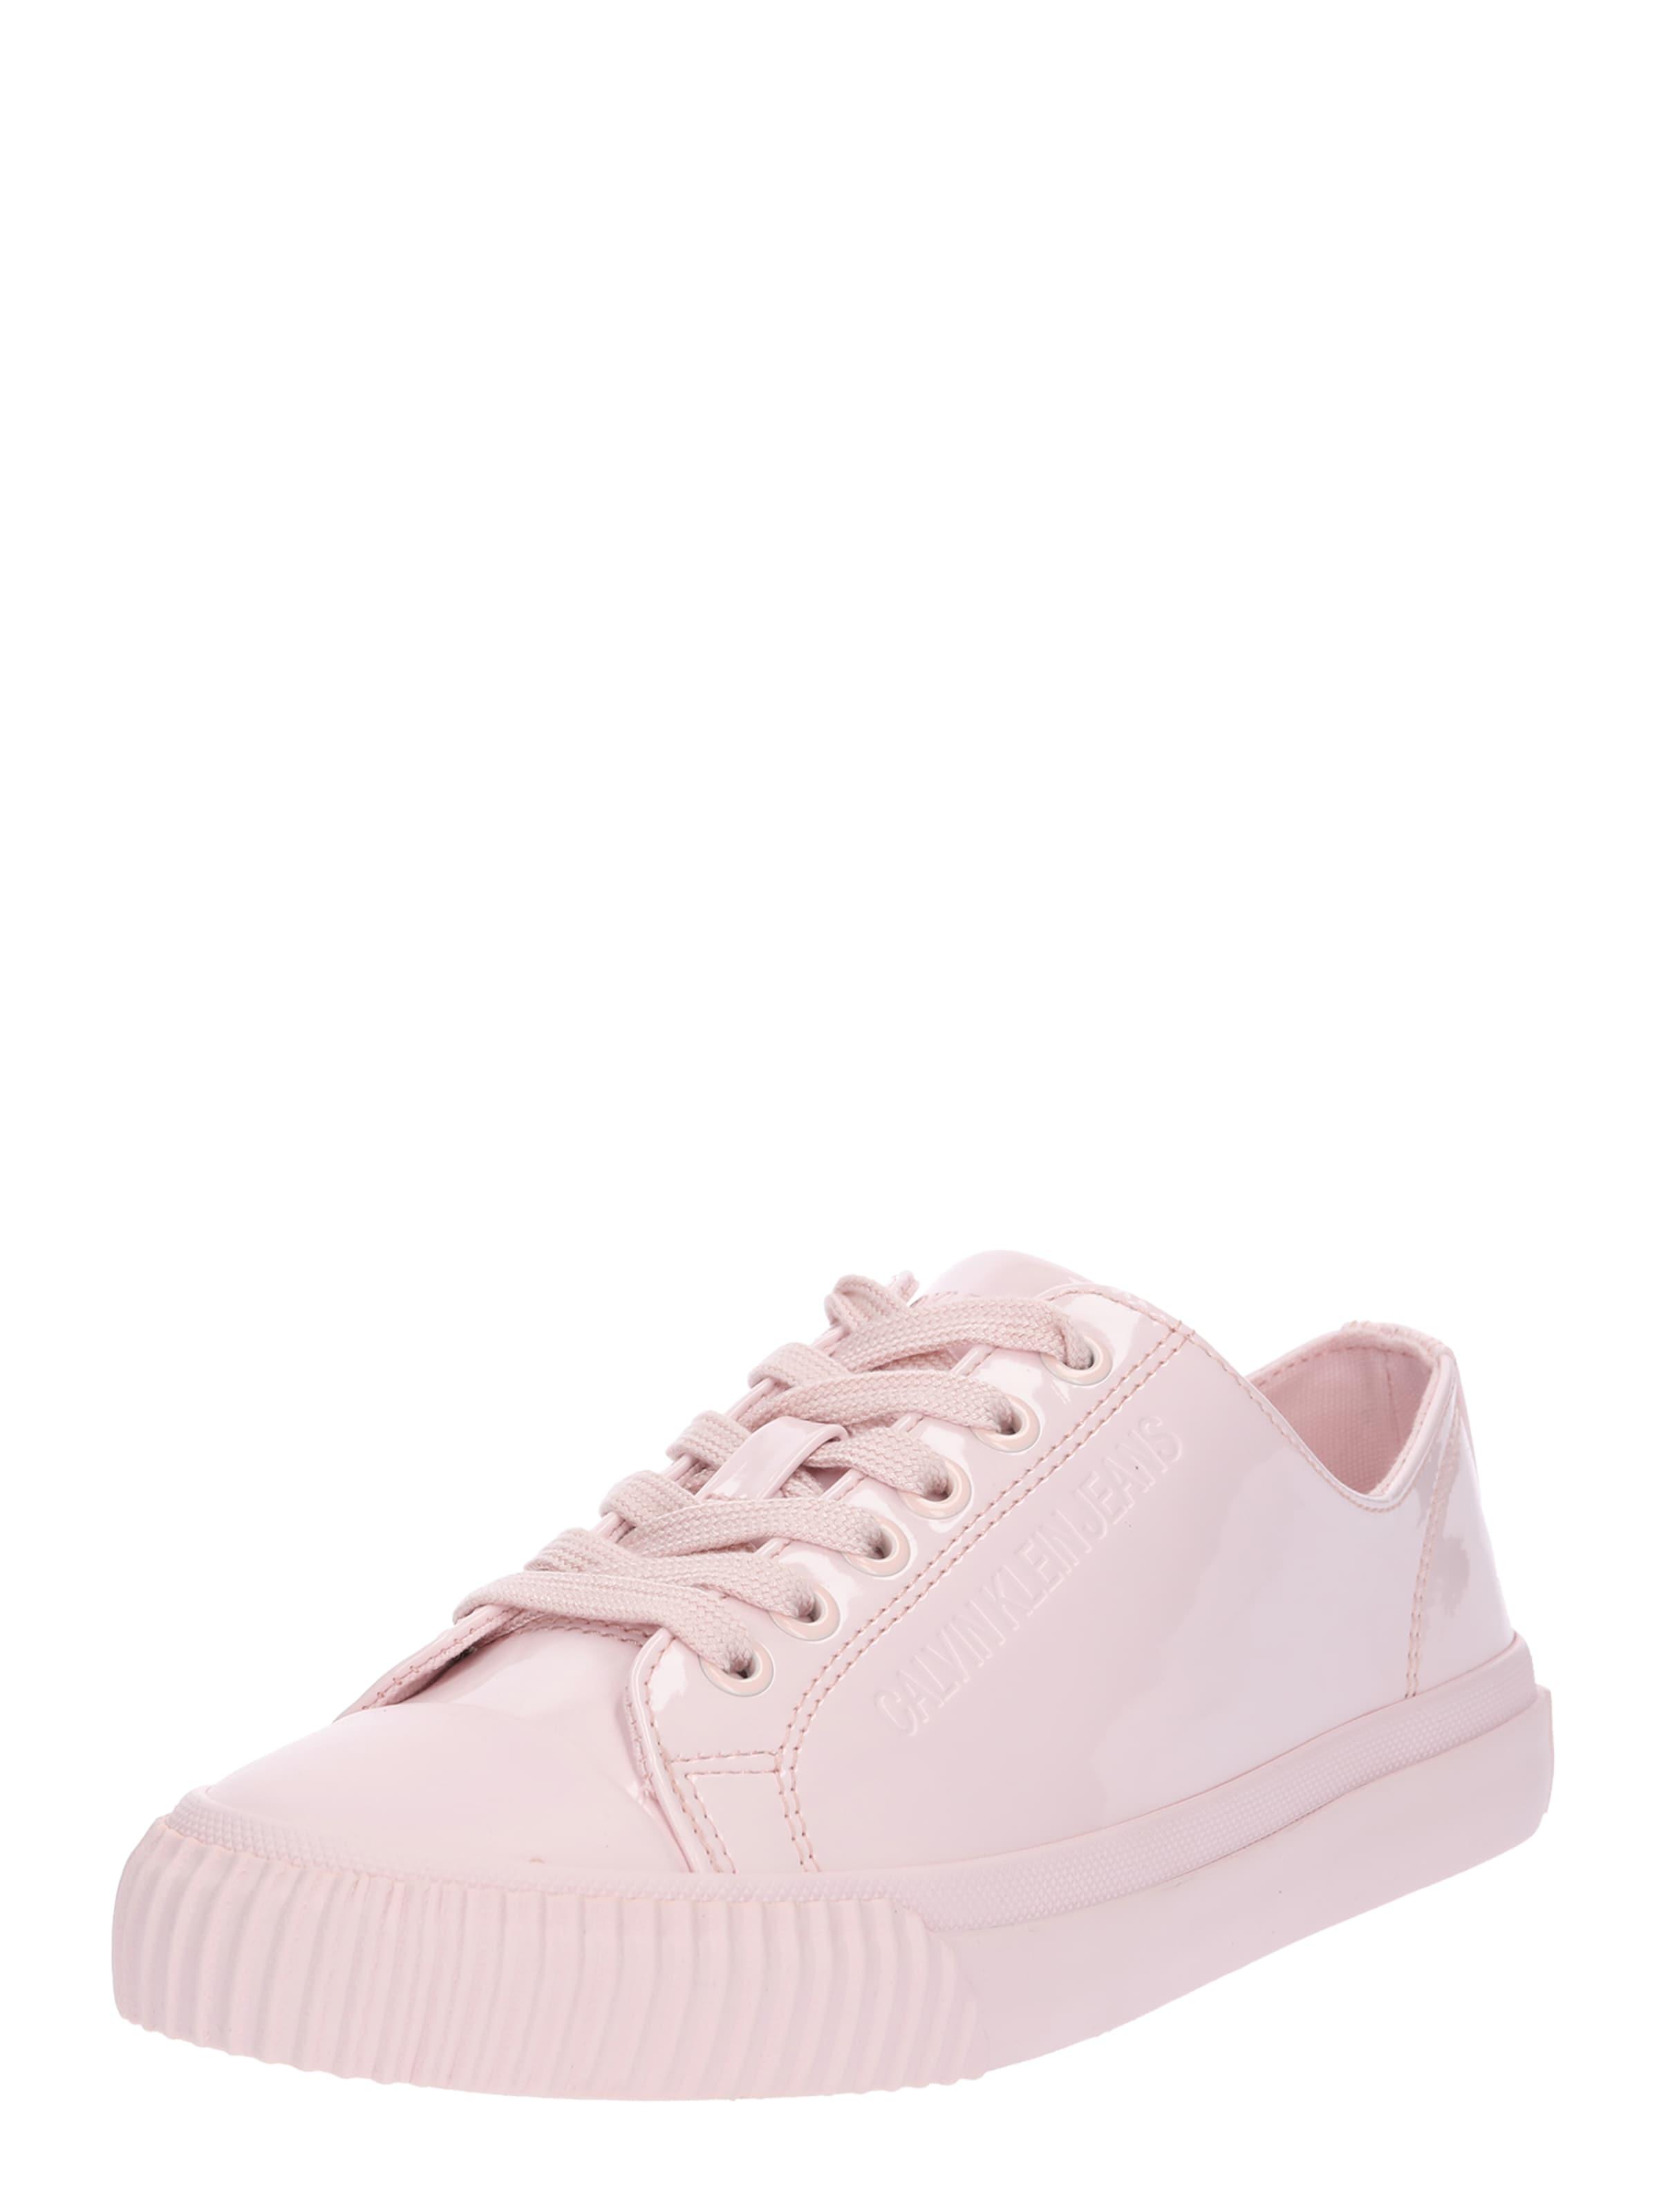 Klein Sneaker 'ireland' In Calvin Jeans Rosa T1FKJluc3